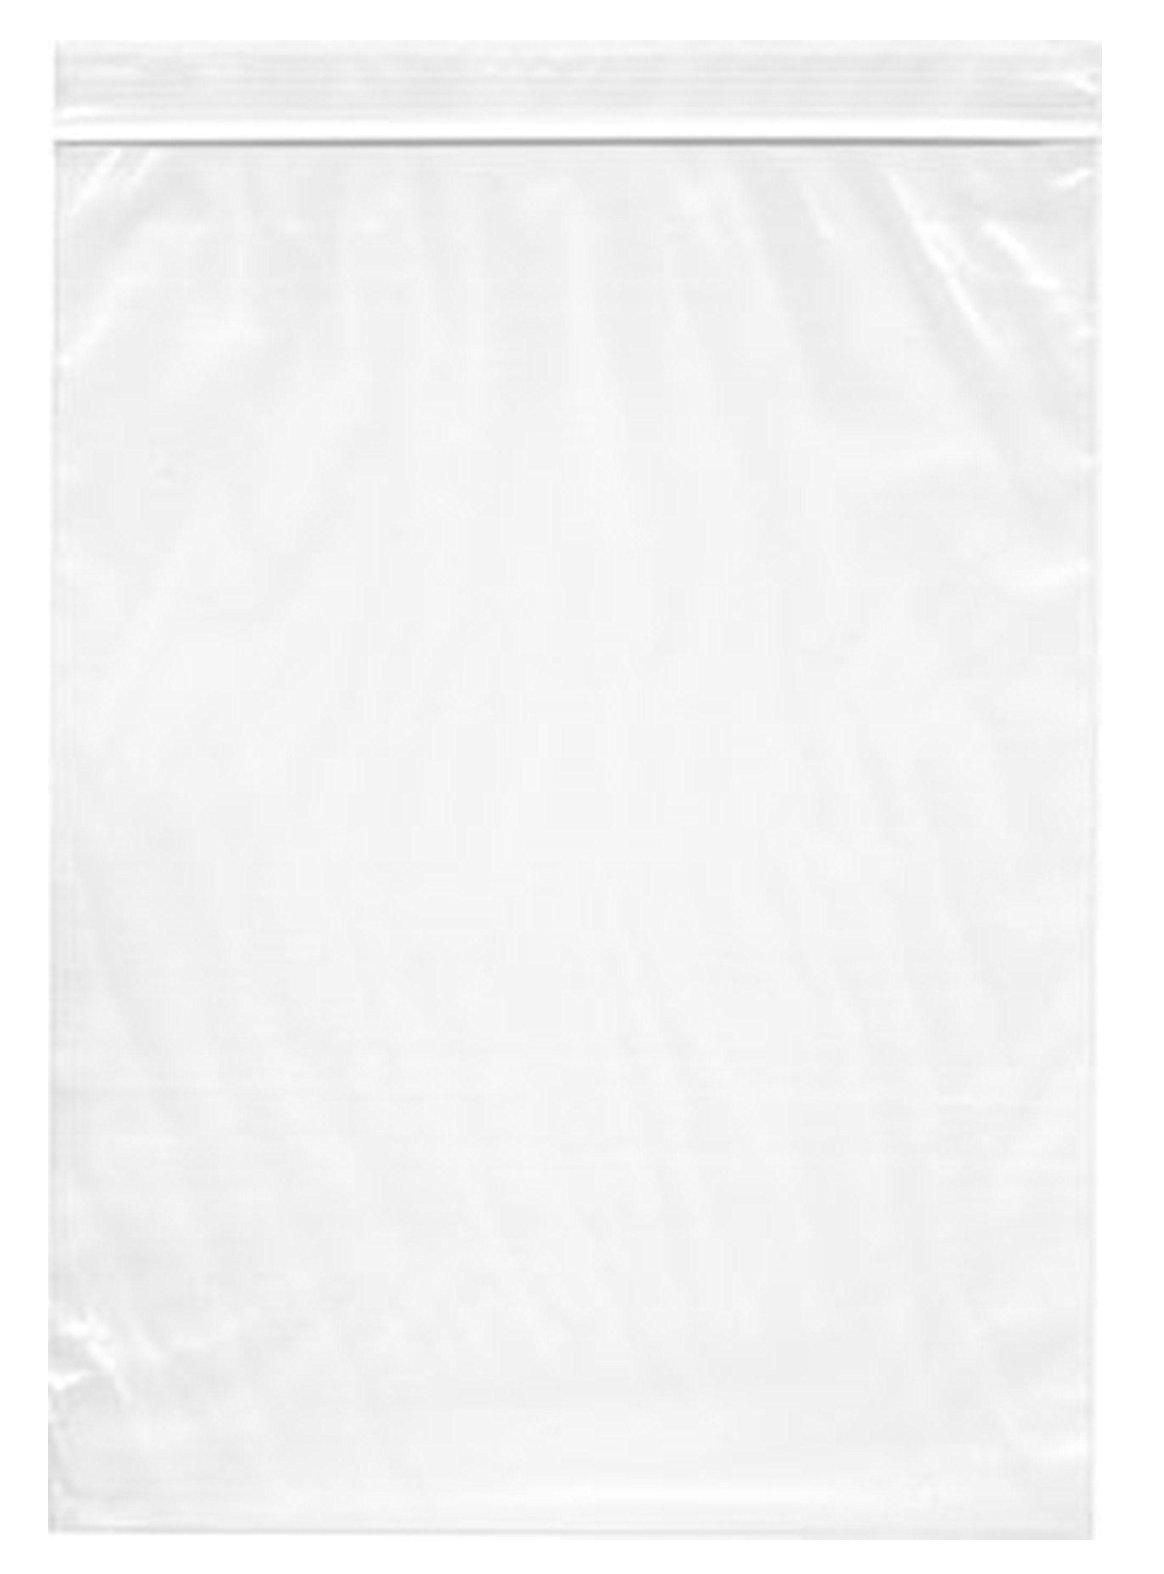 Large Ziplock 13 x 15, 2 Mil Resealable Zipper Jumbo size Plastic 2-Gallon Storage poly Bags (100)